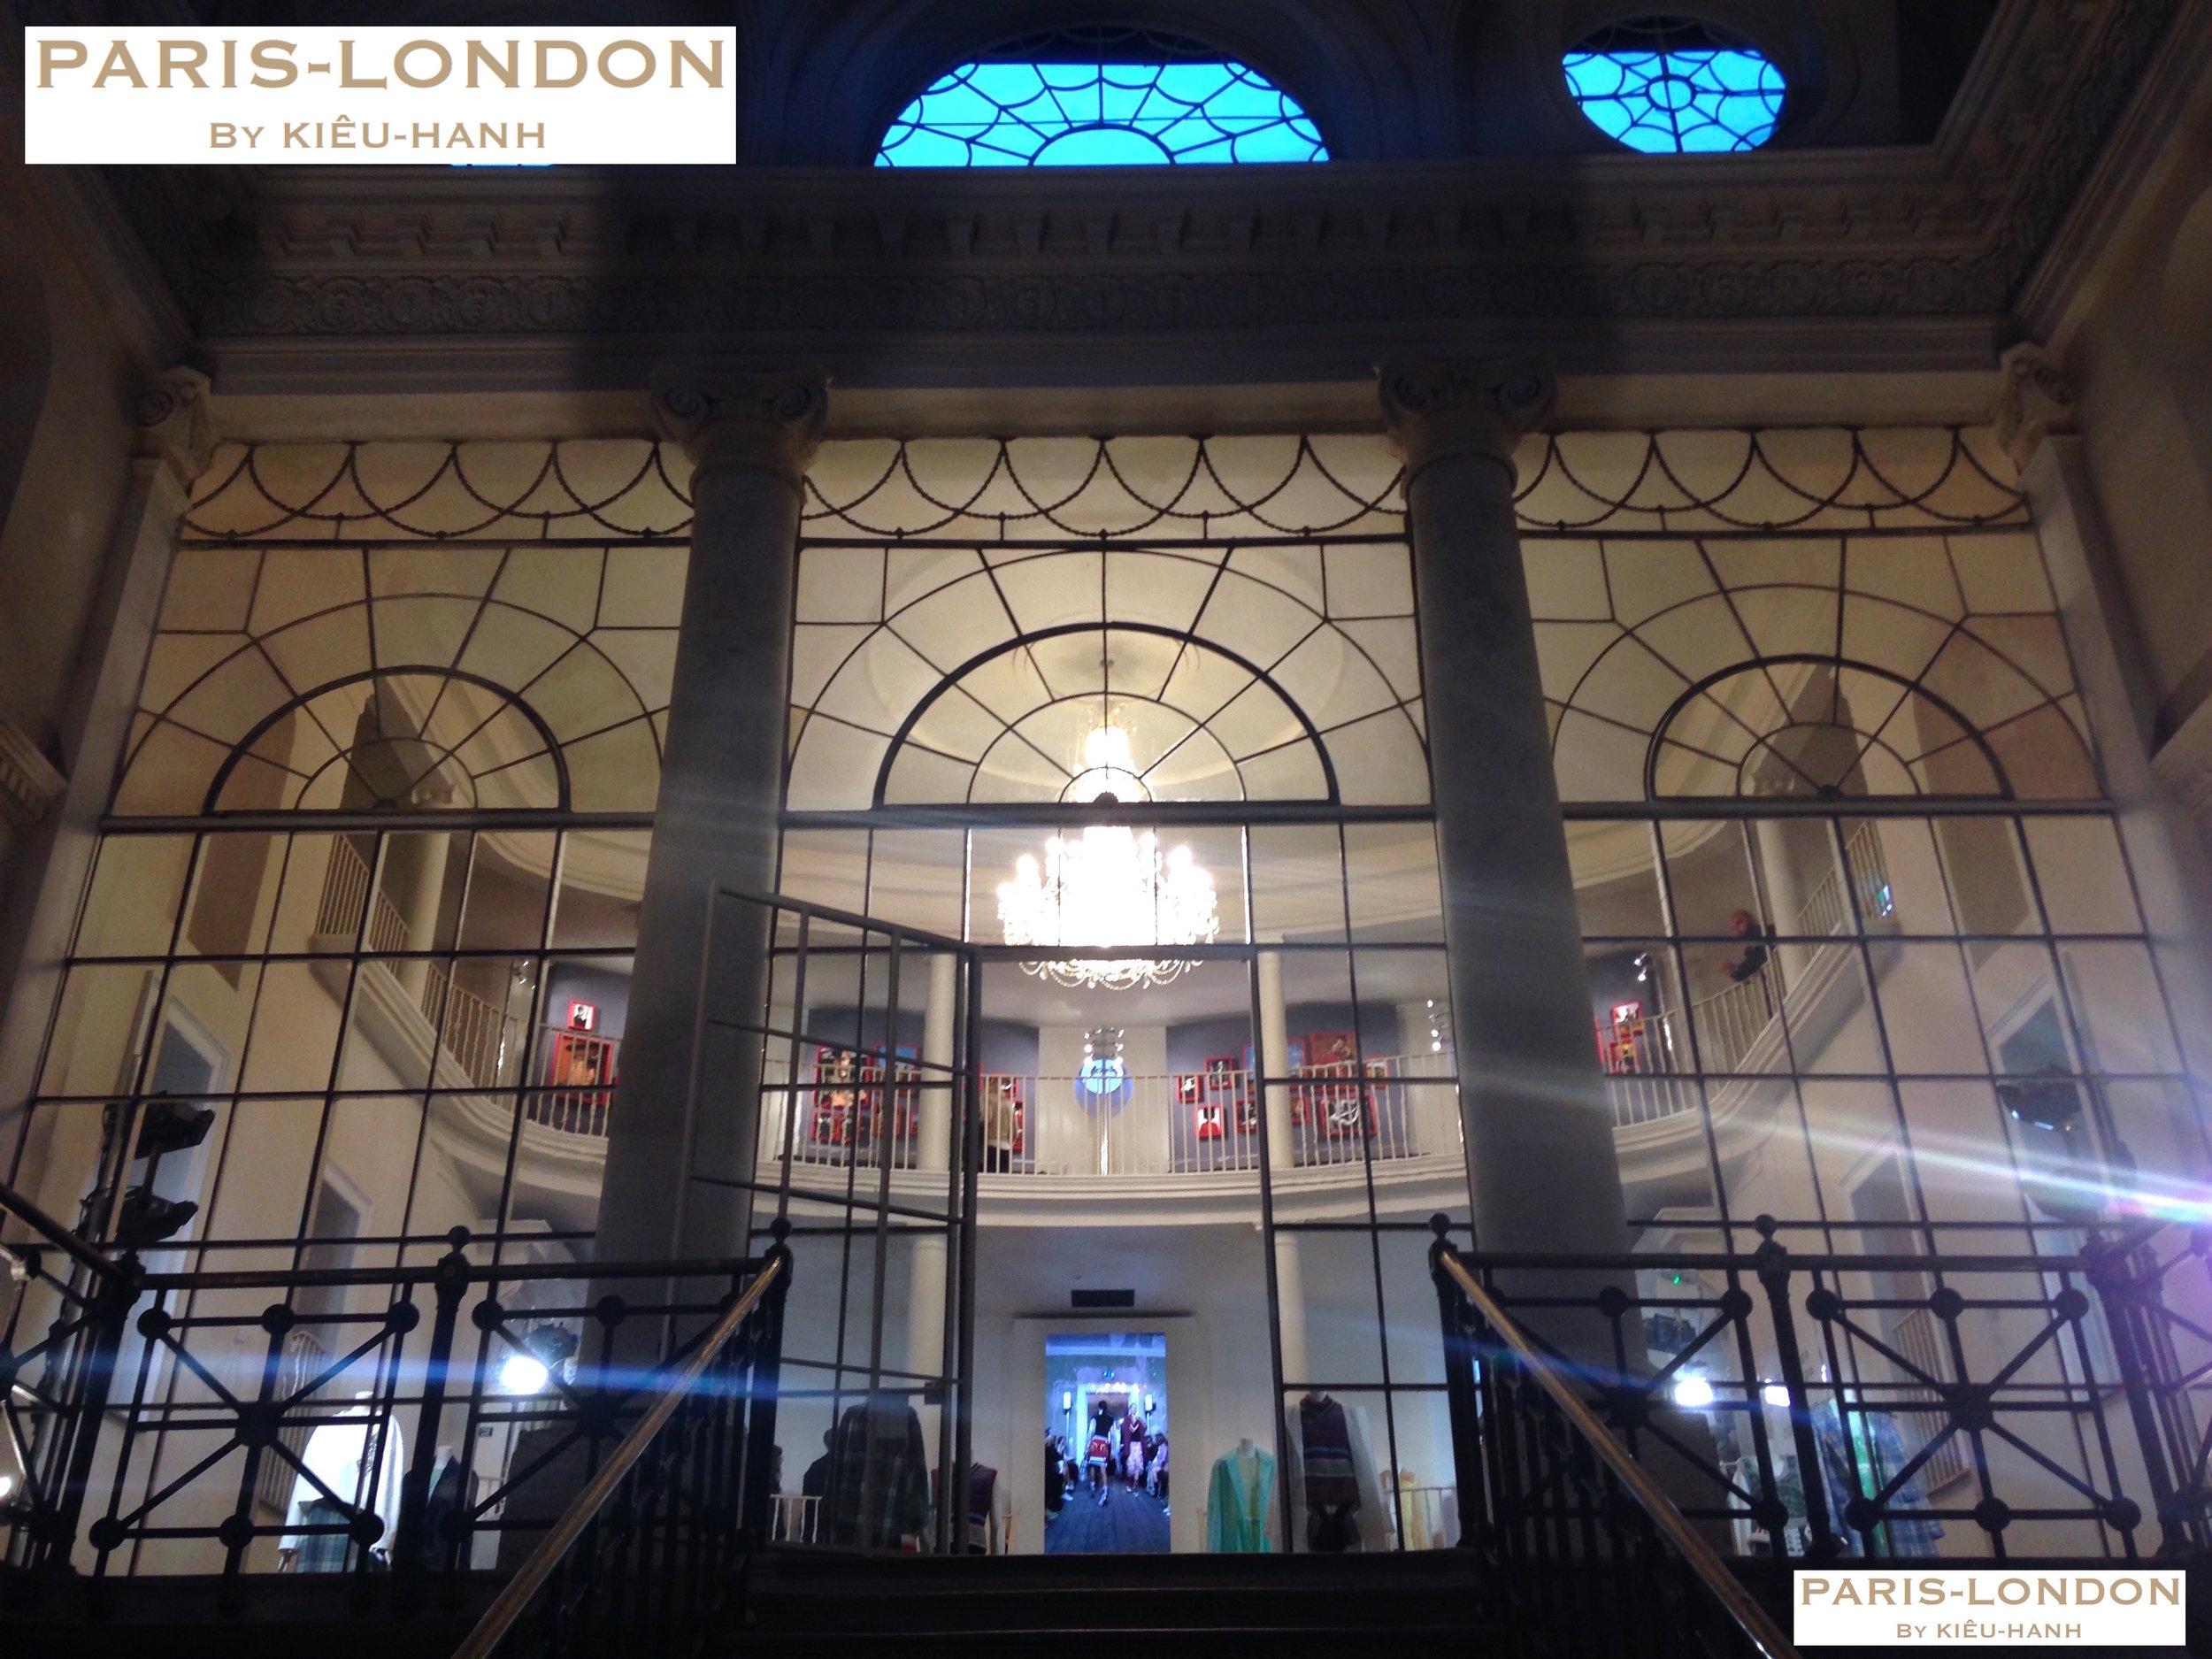 London Fashion Week (3). Paris-London By Kieu-Hanh.jpg